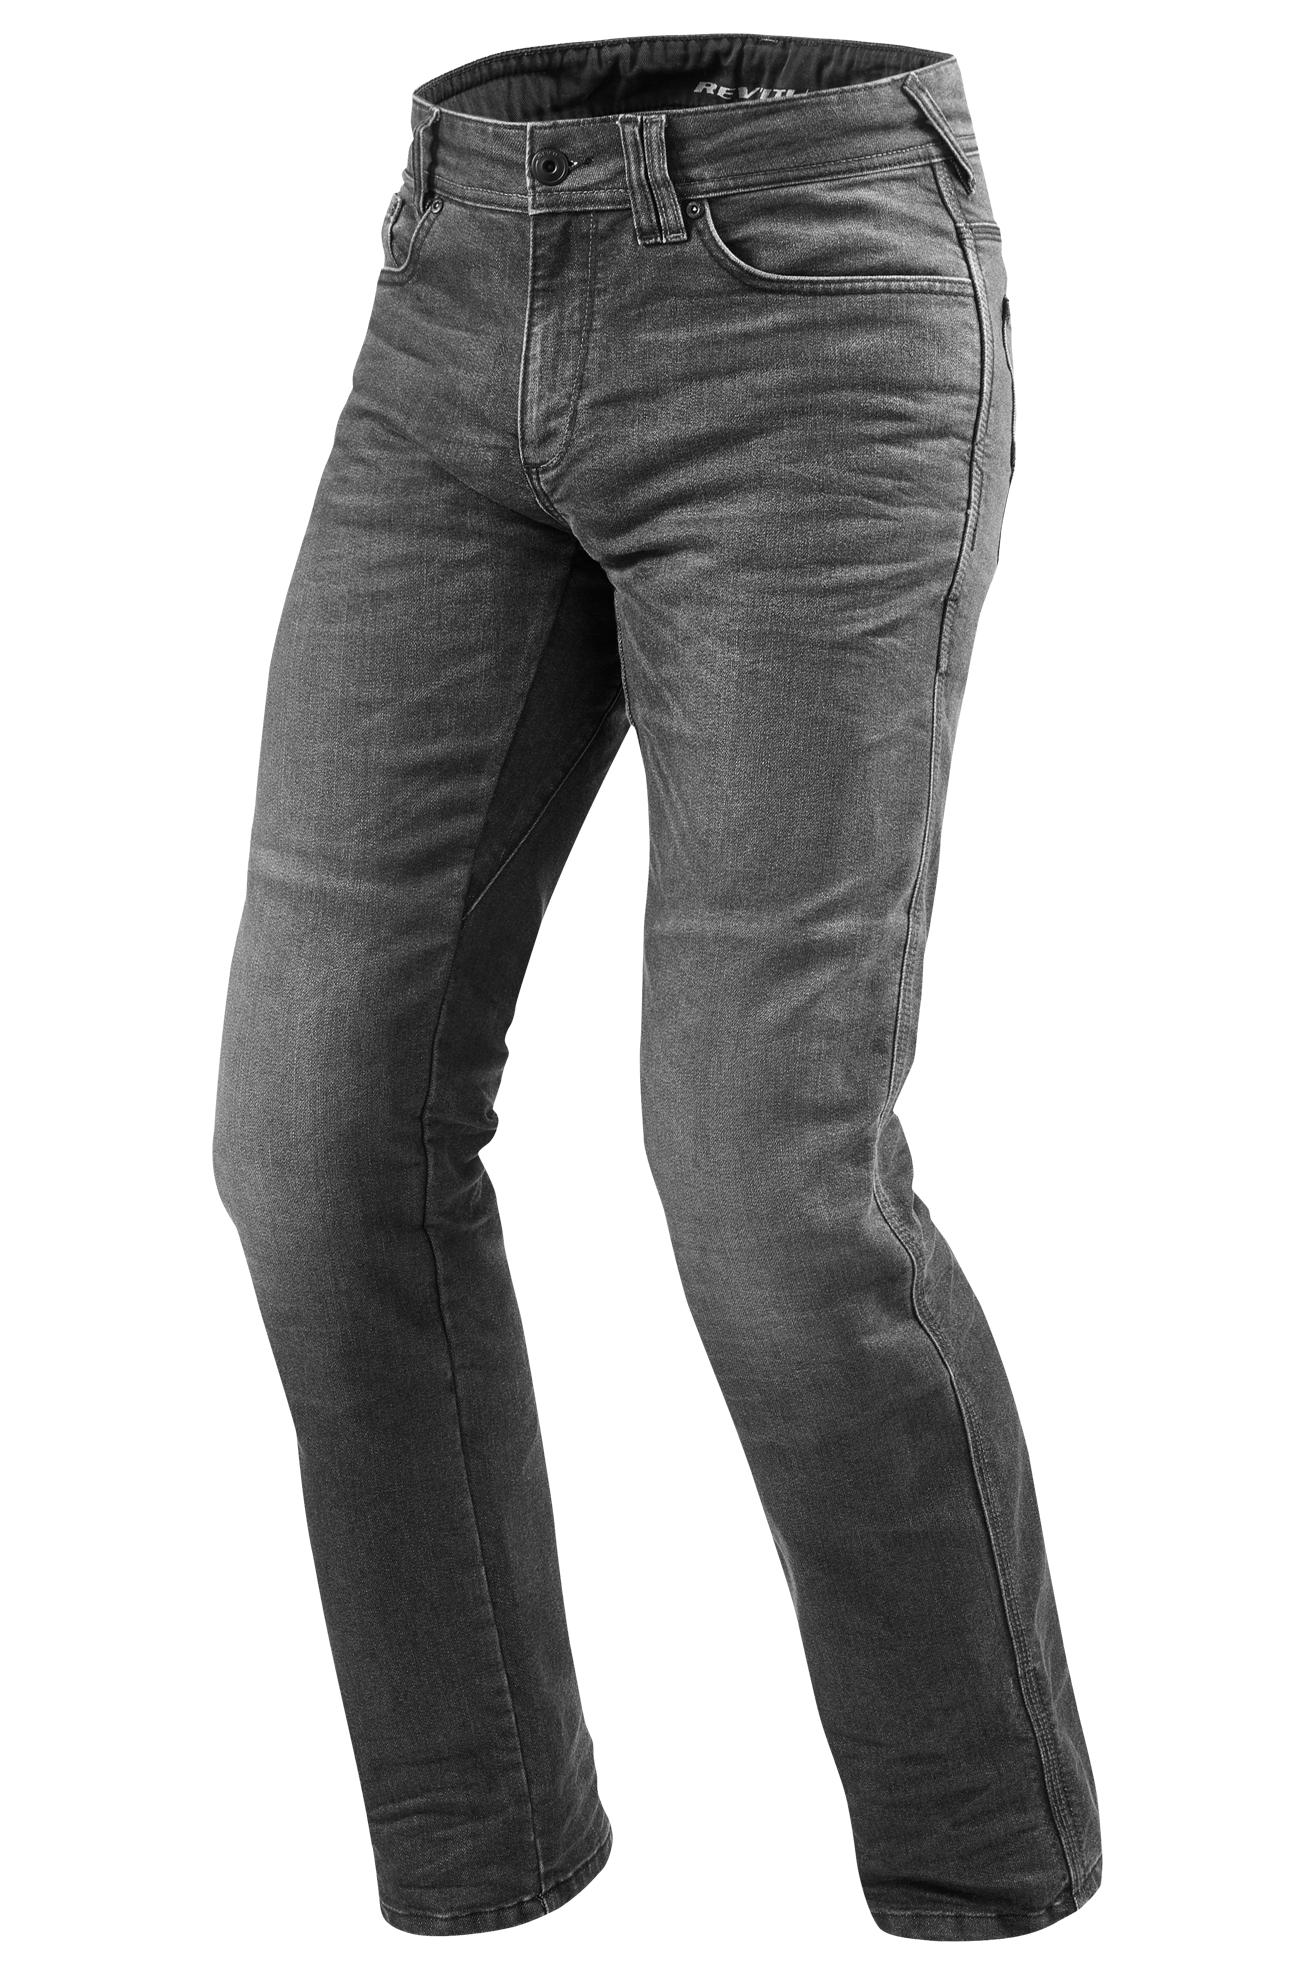 REV'IT! Jeans  Philly 2 Grigio Scuro